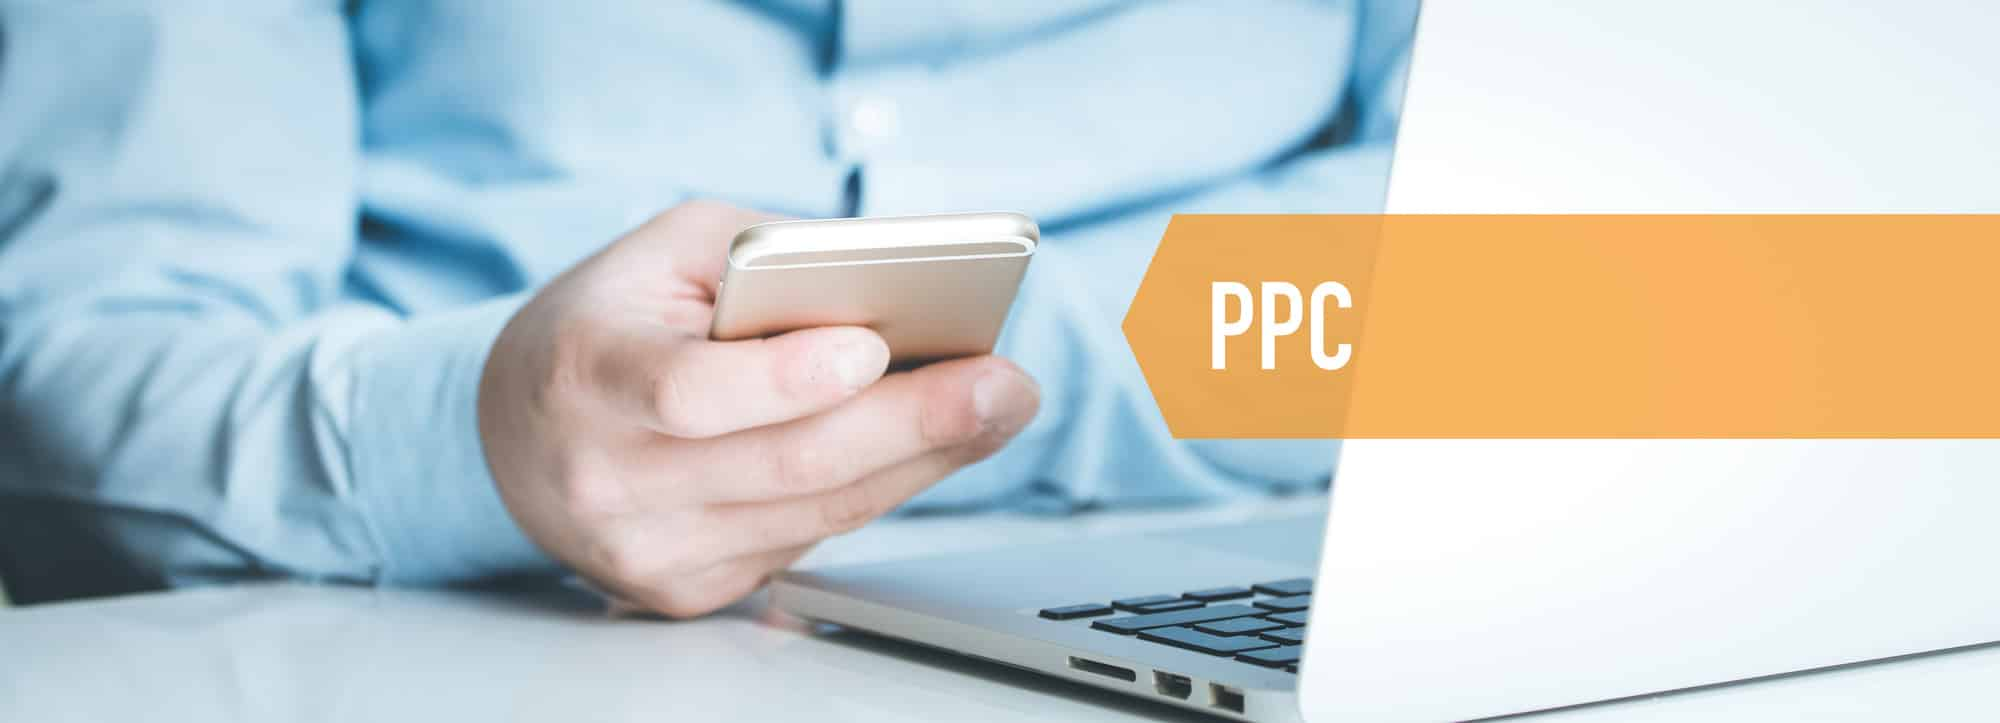 TECHNOLOGY CONCEPT: PPC Campaign